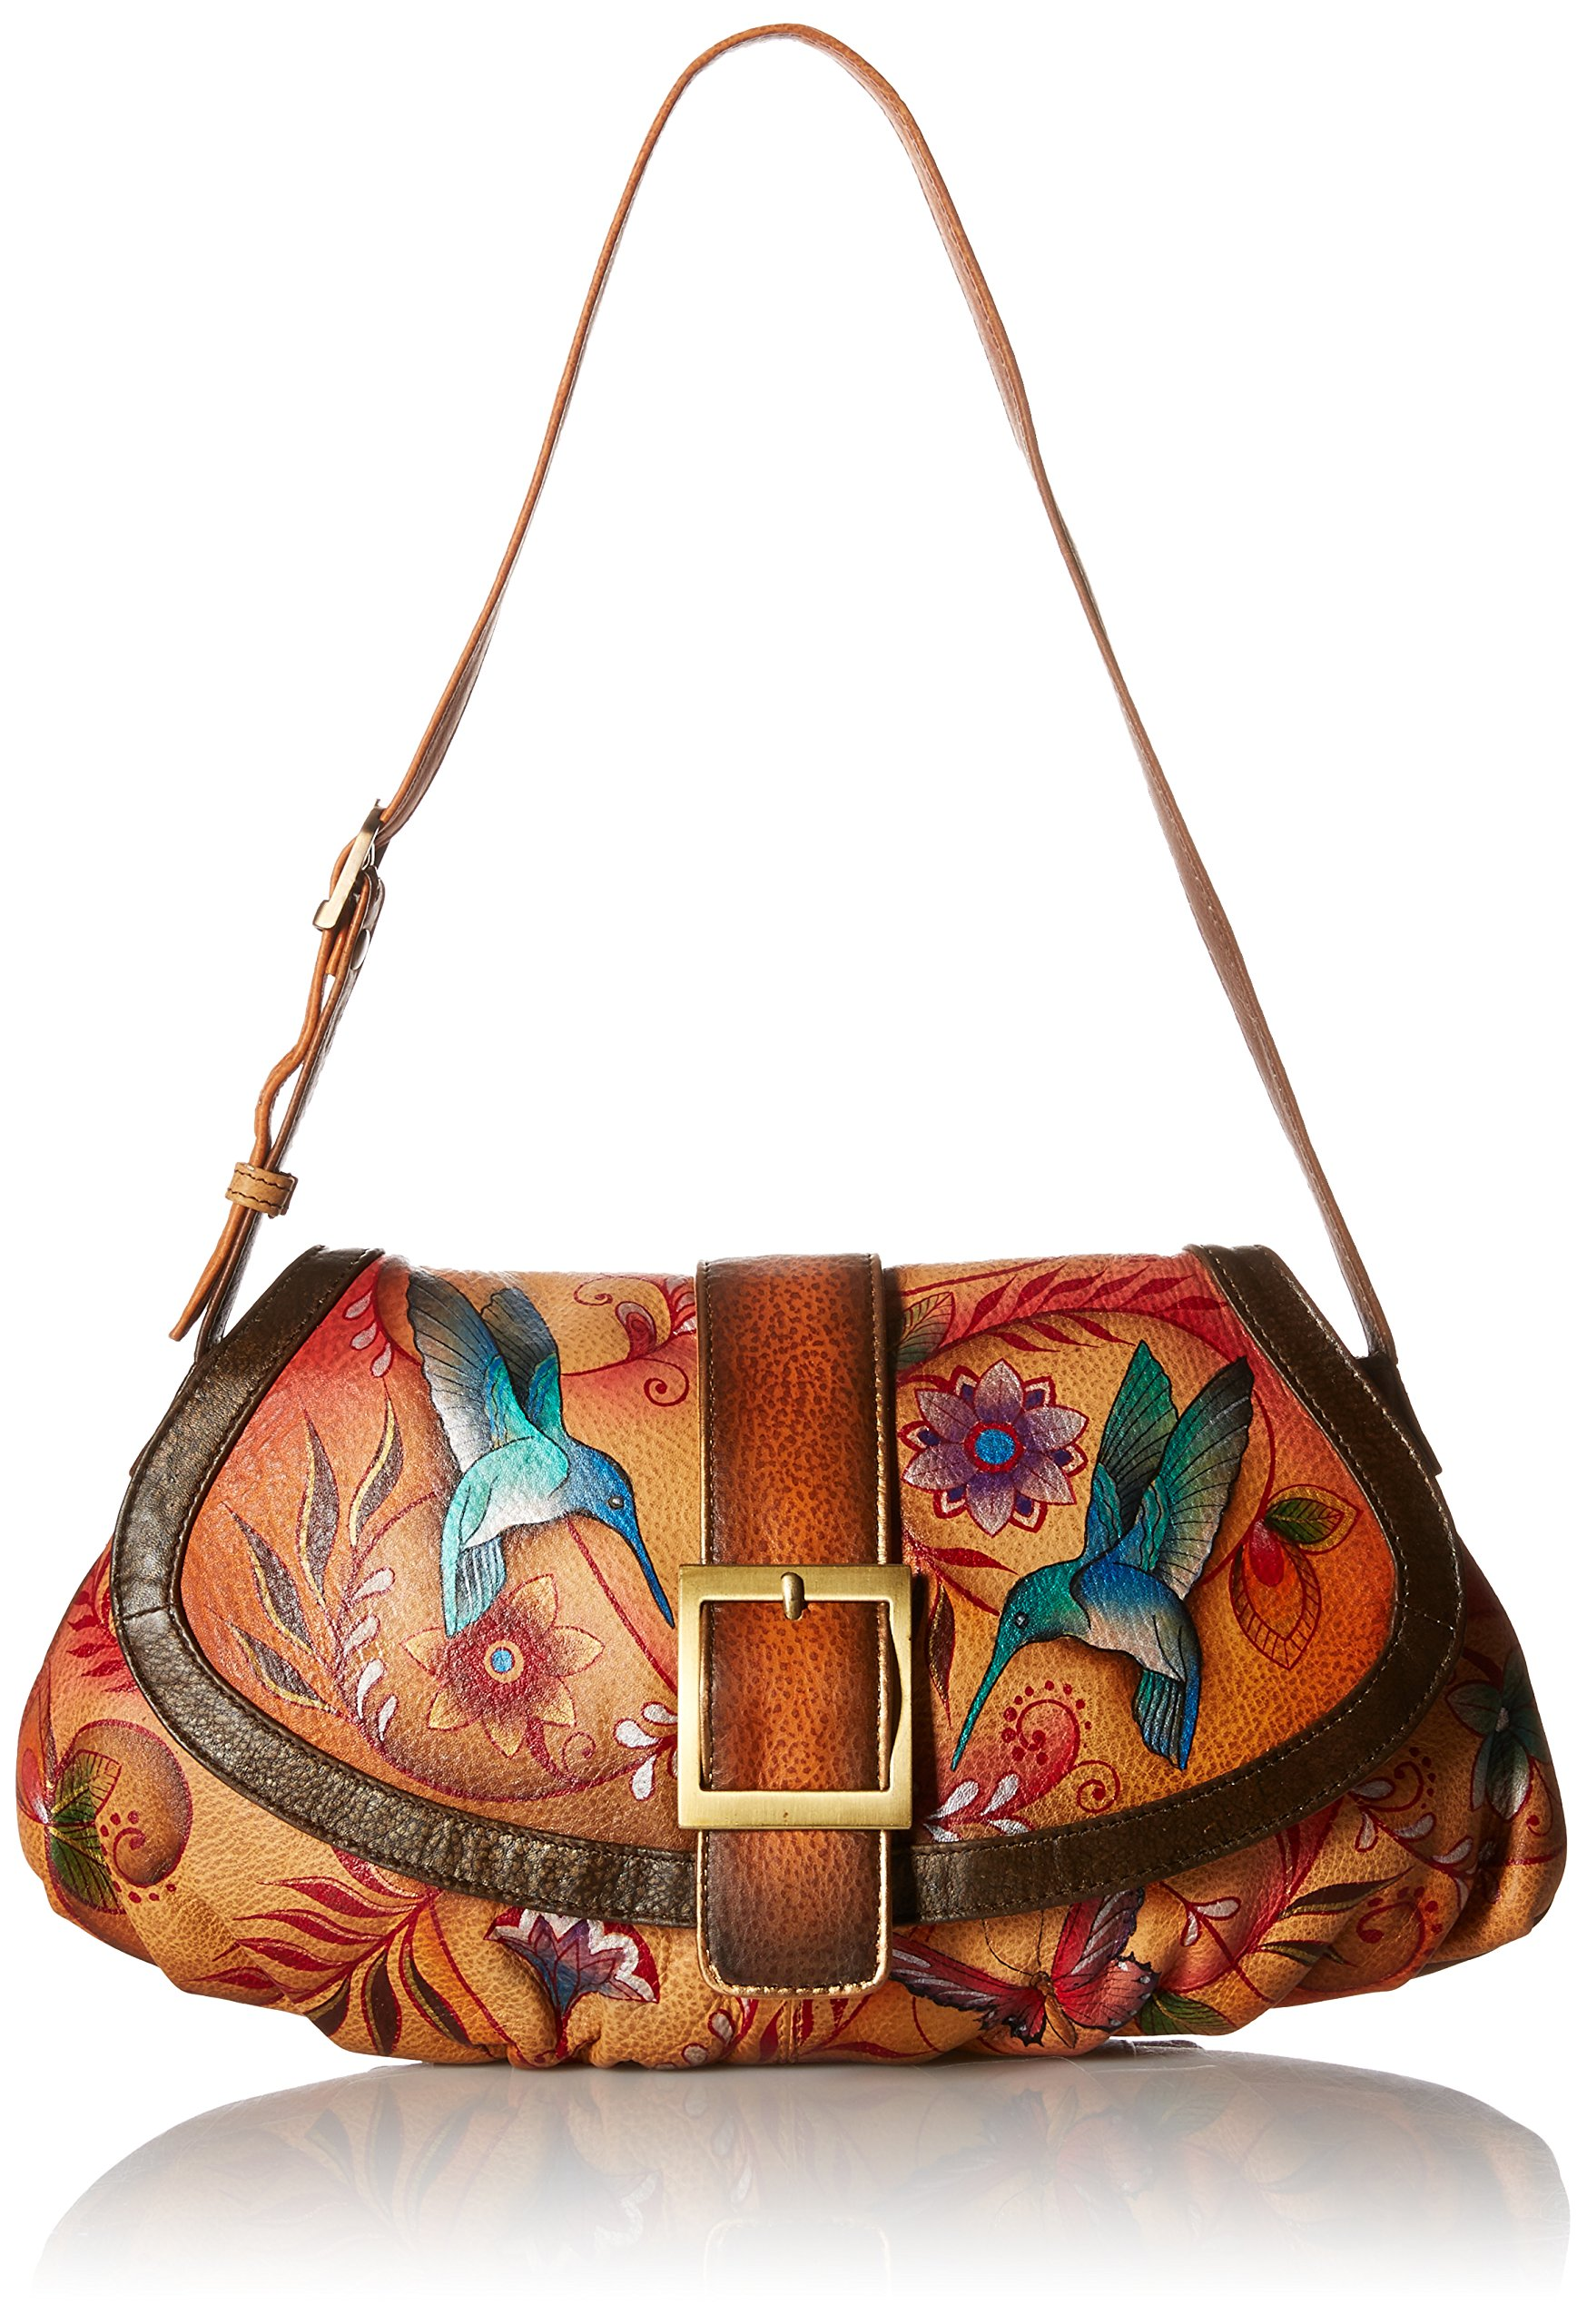 Anuschka Small Ruched Flap Handbag FJT, Flying Jewels Tan, One Size